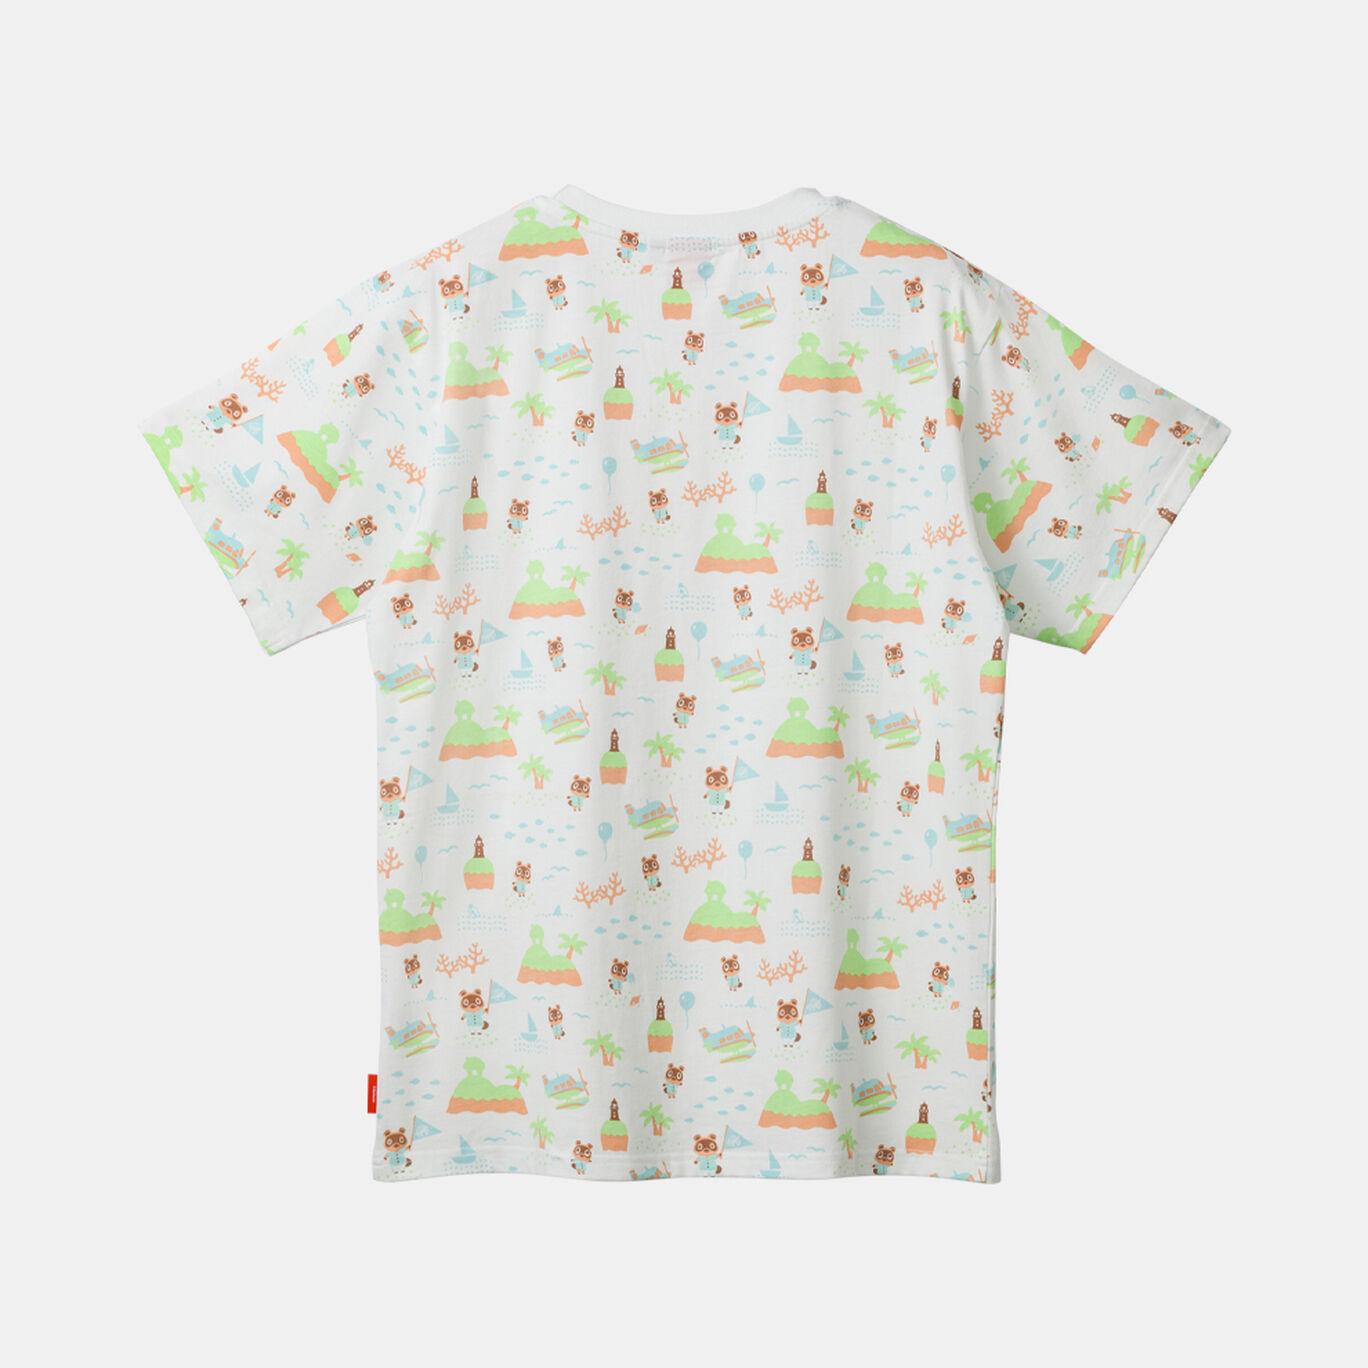 TシャツB S あつまれ どうぶつの森【Nintendo TOKYO取り扱い商品】